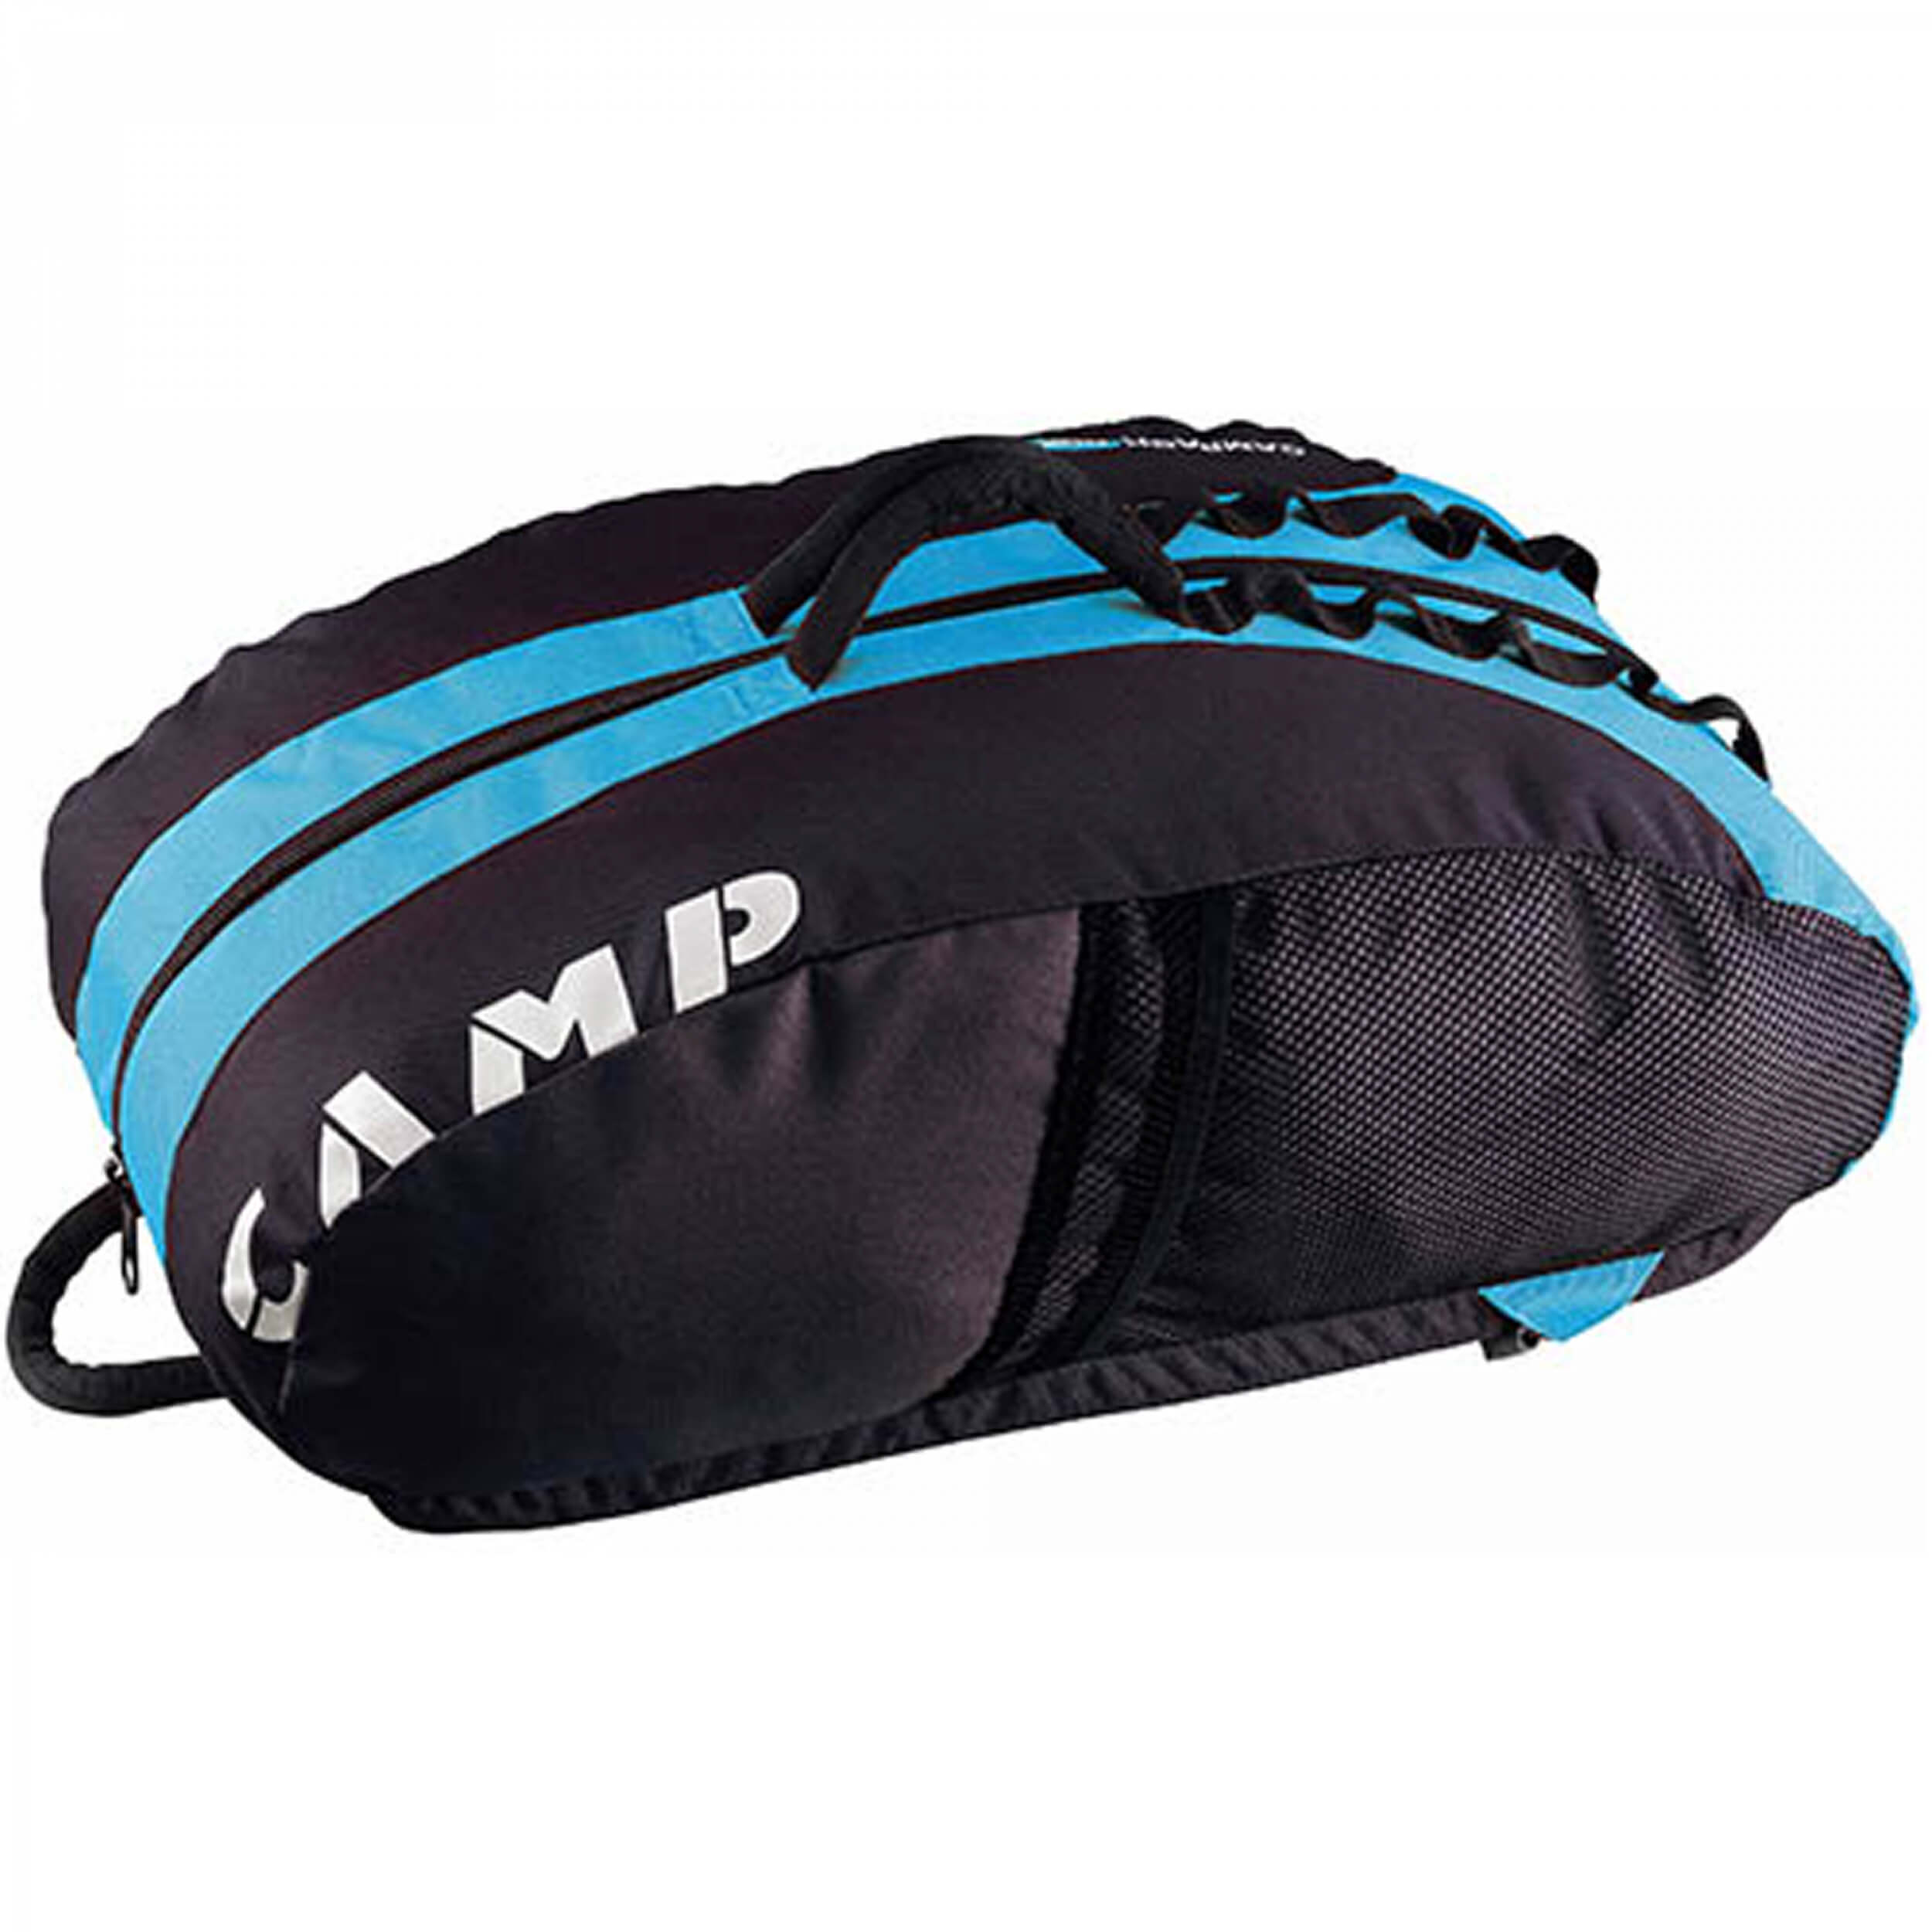 CAMP Rox Sky Blue / Black - 40 L